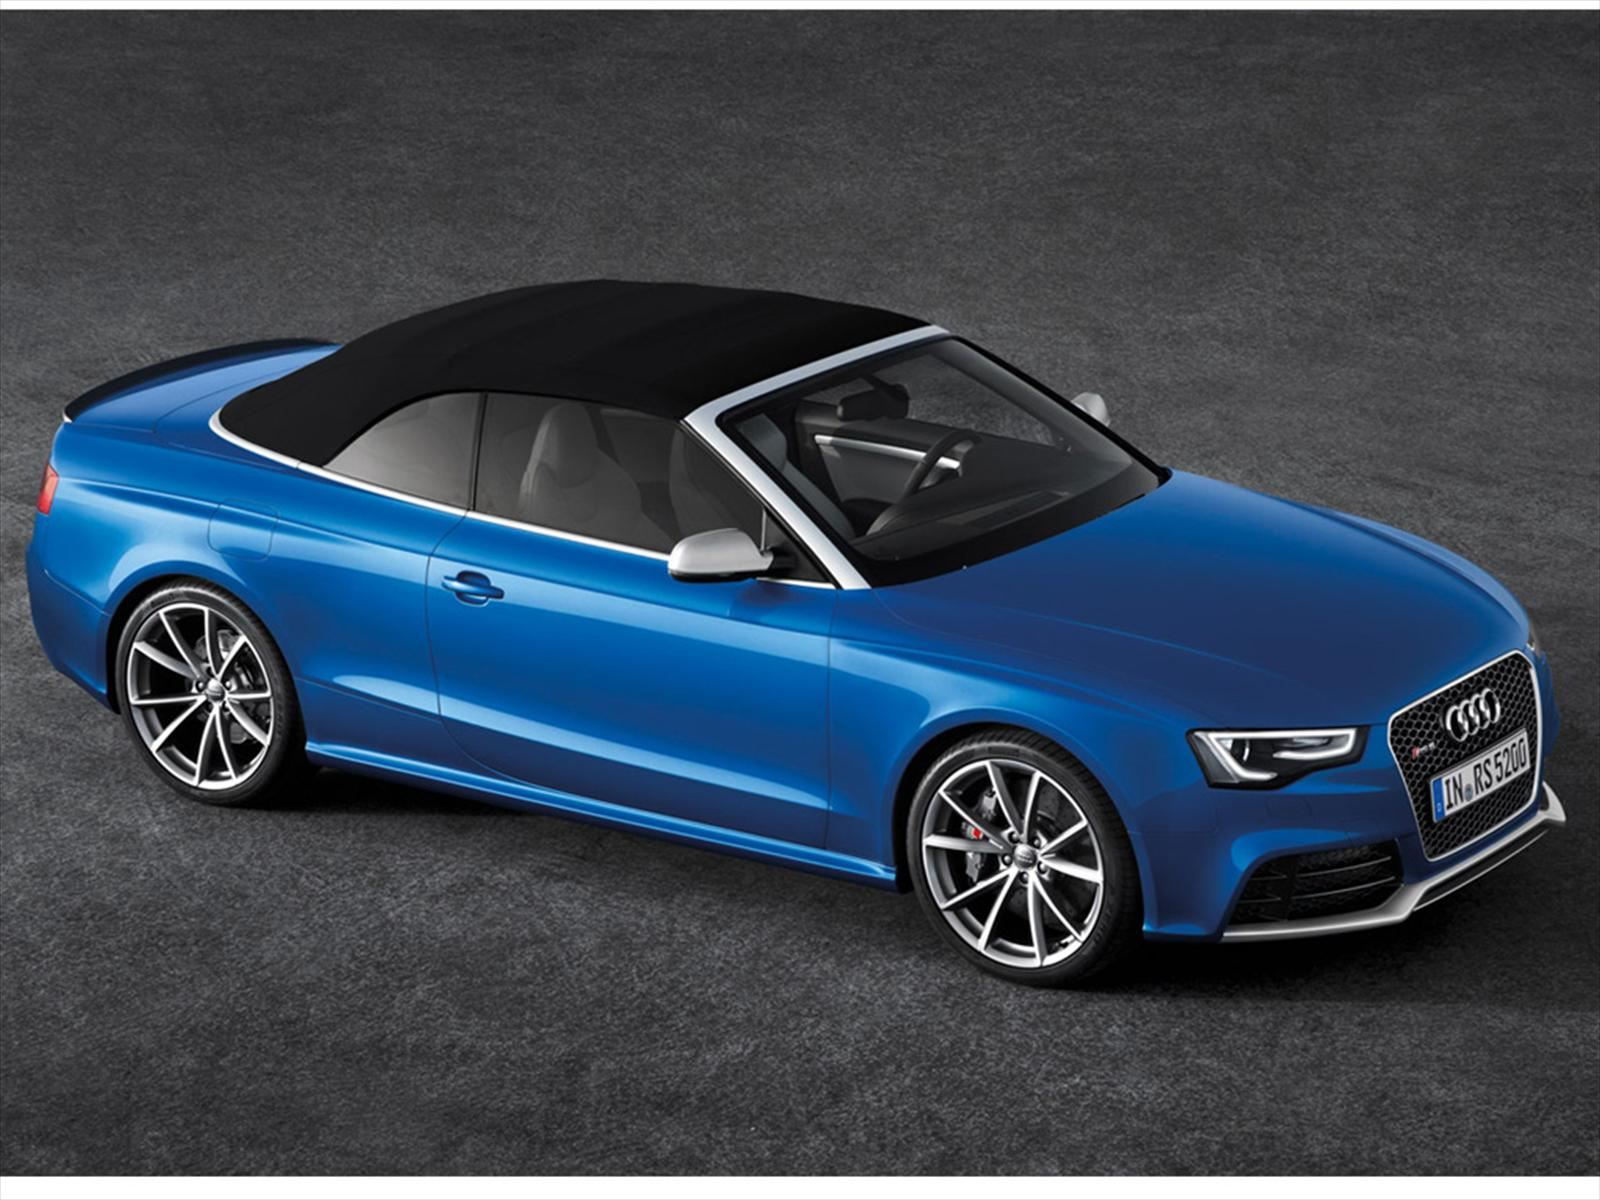 Audi Rs5 Cabriolet 2013 Se Presenta Autocosmos Com